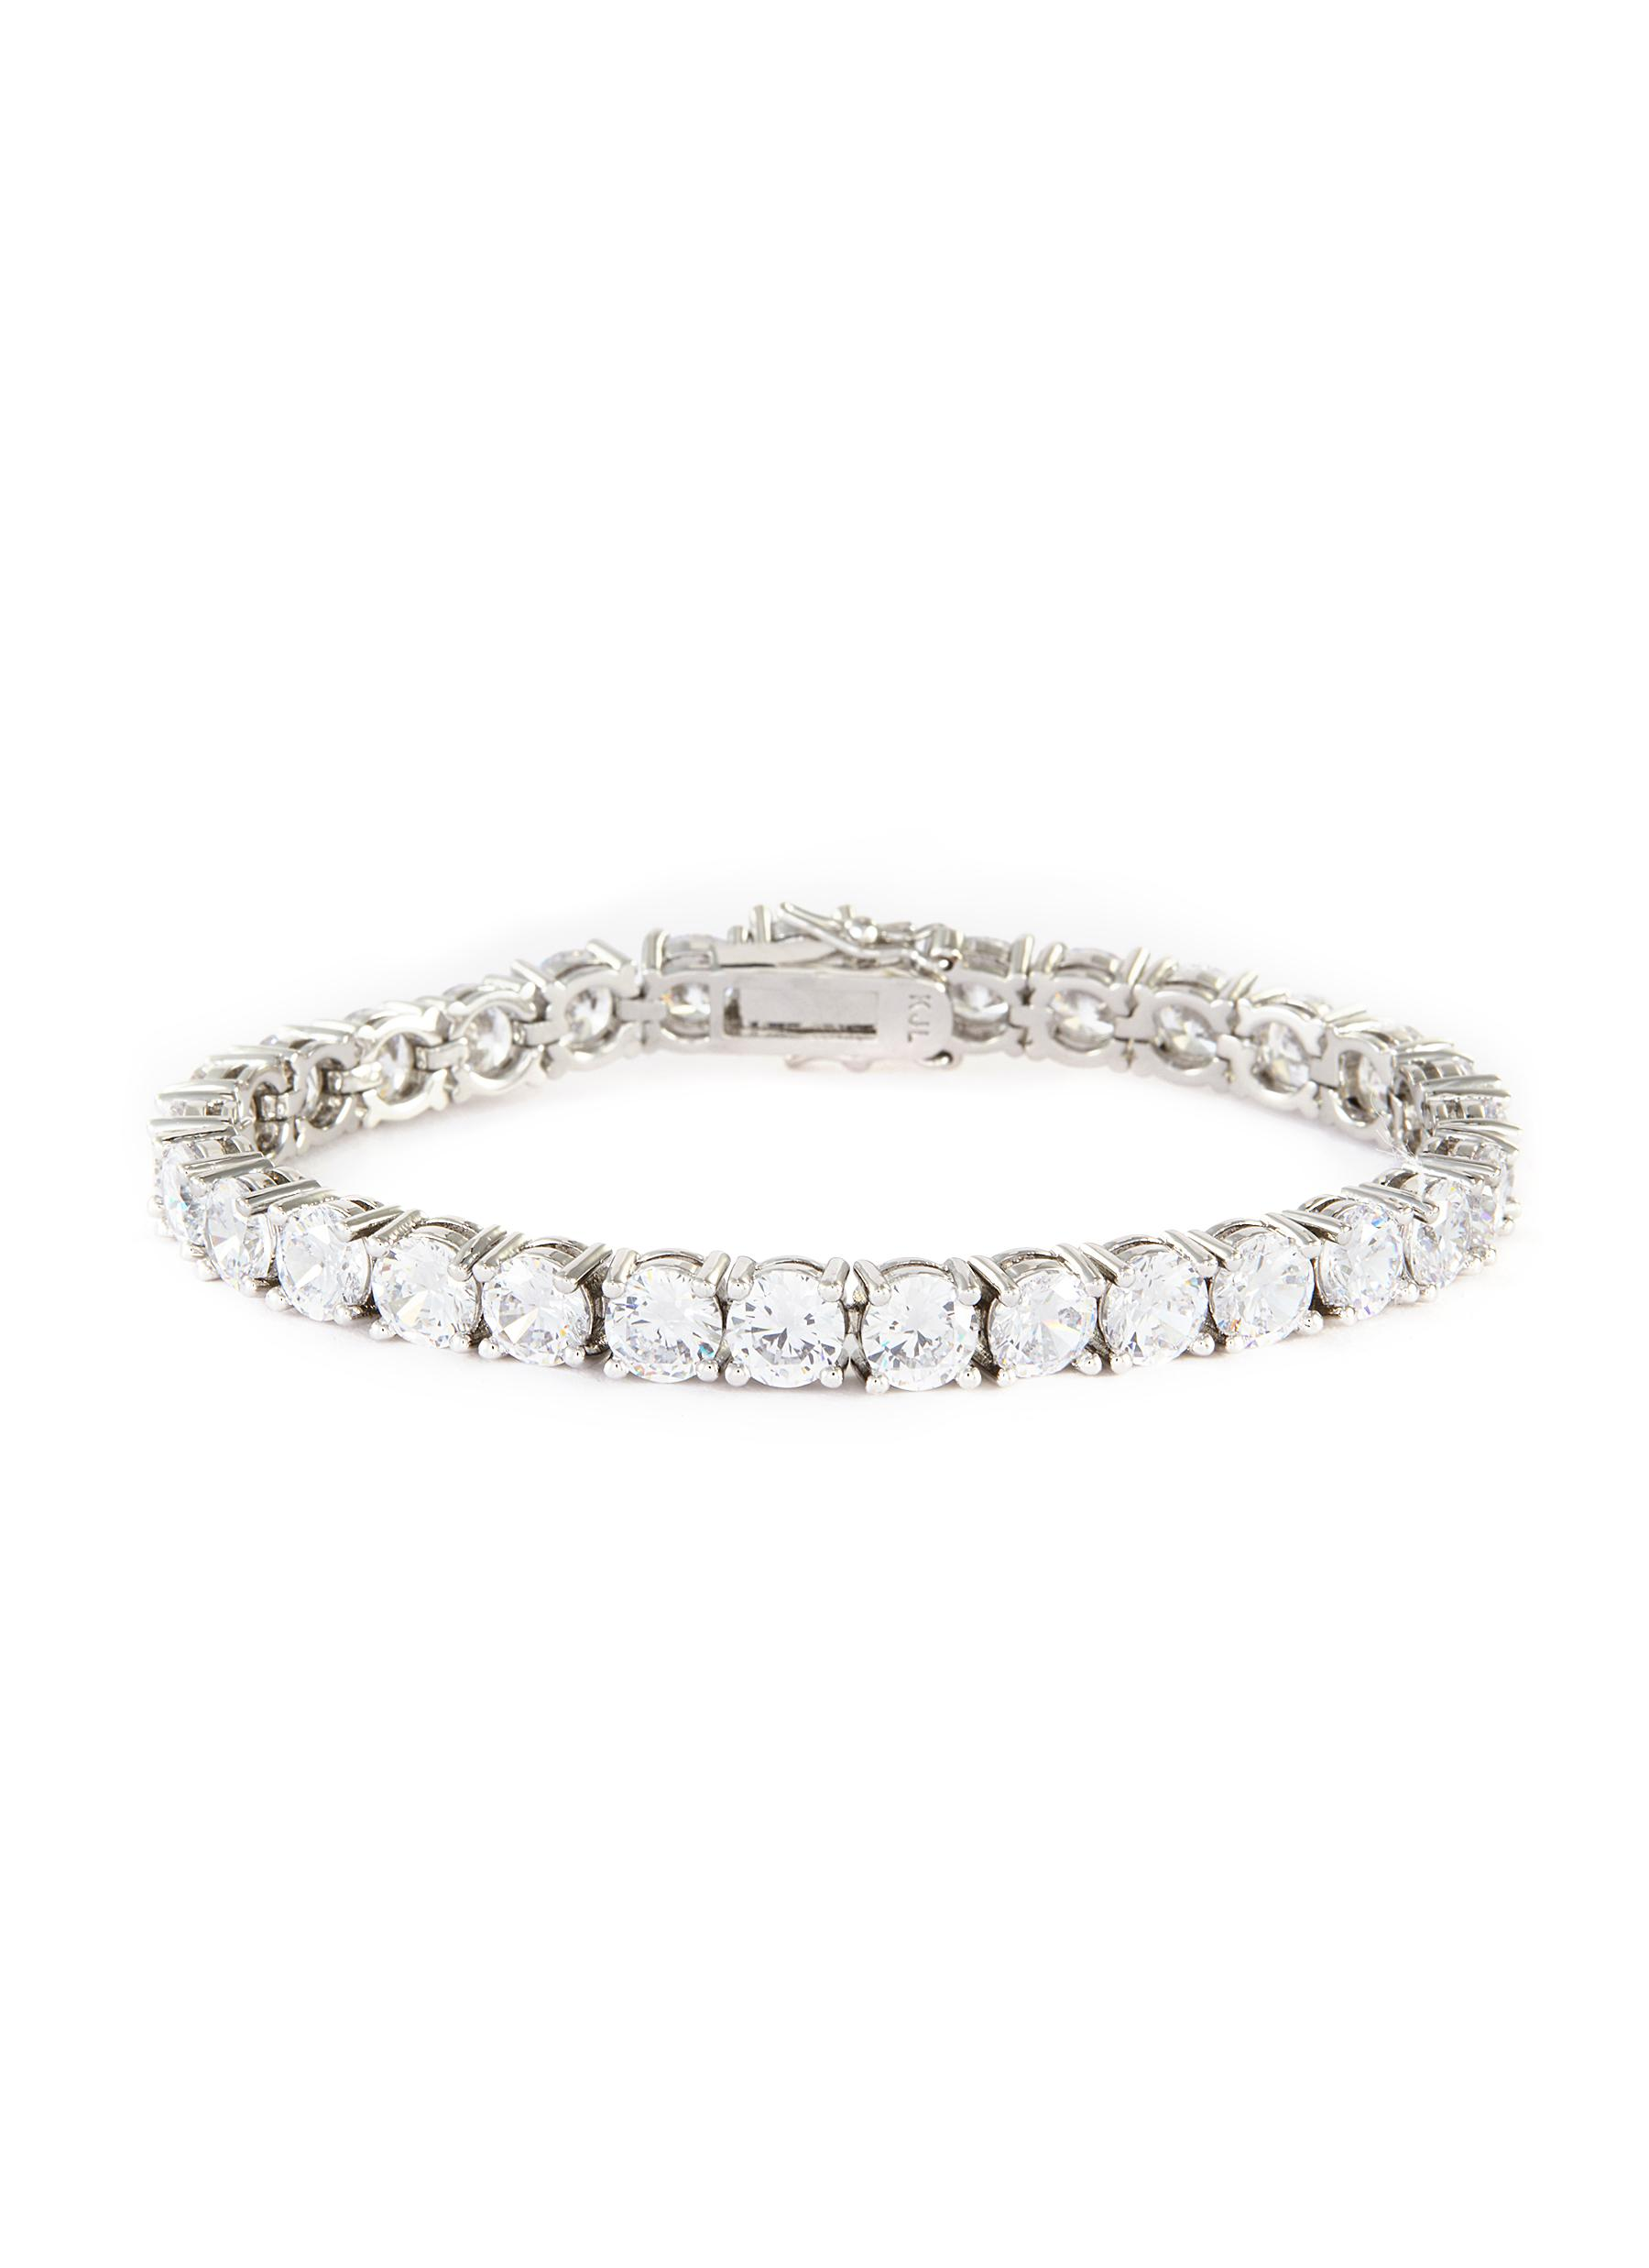 Round cubic zirconia statement bracelet